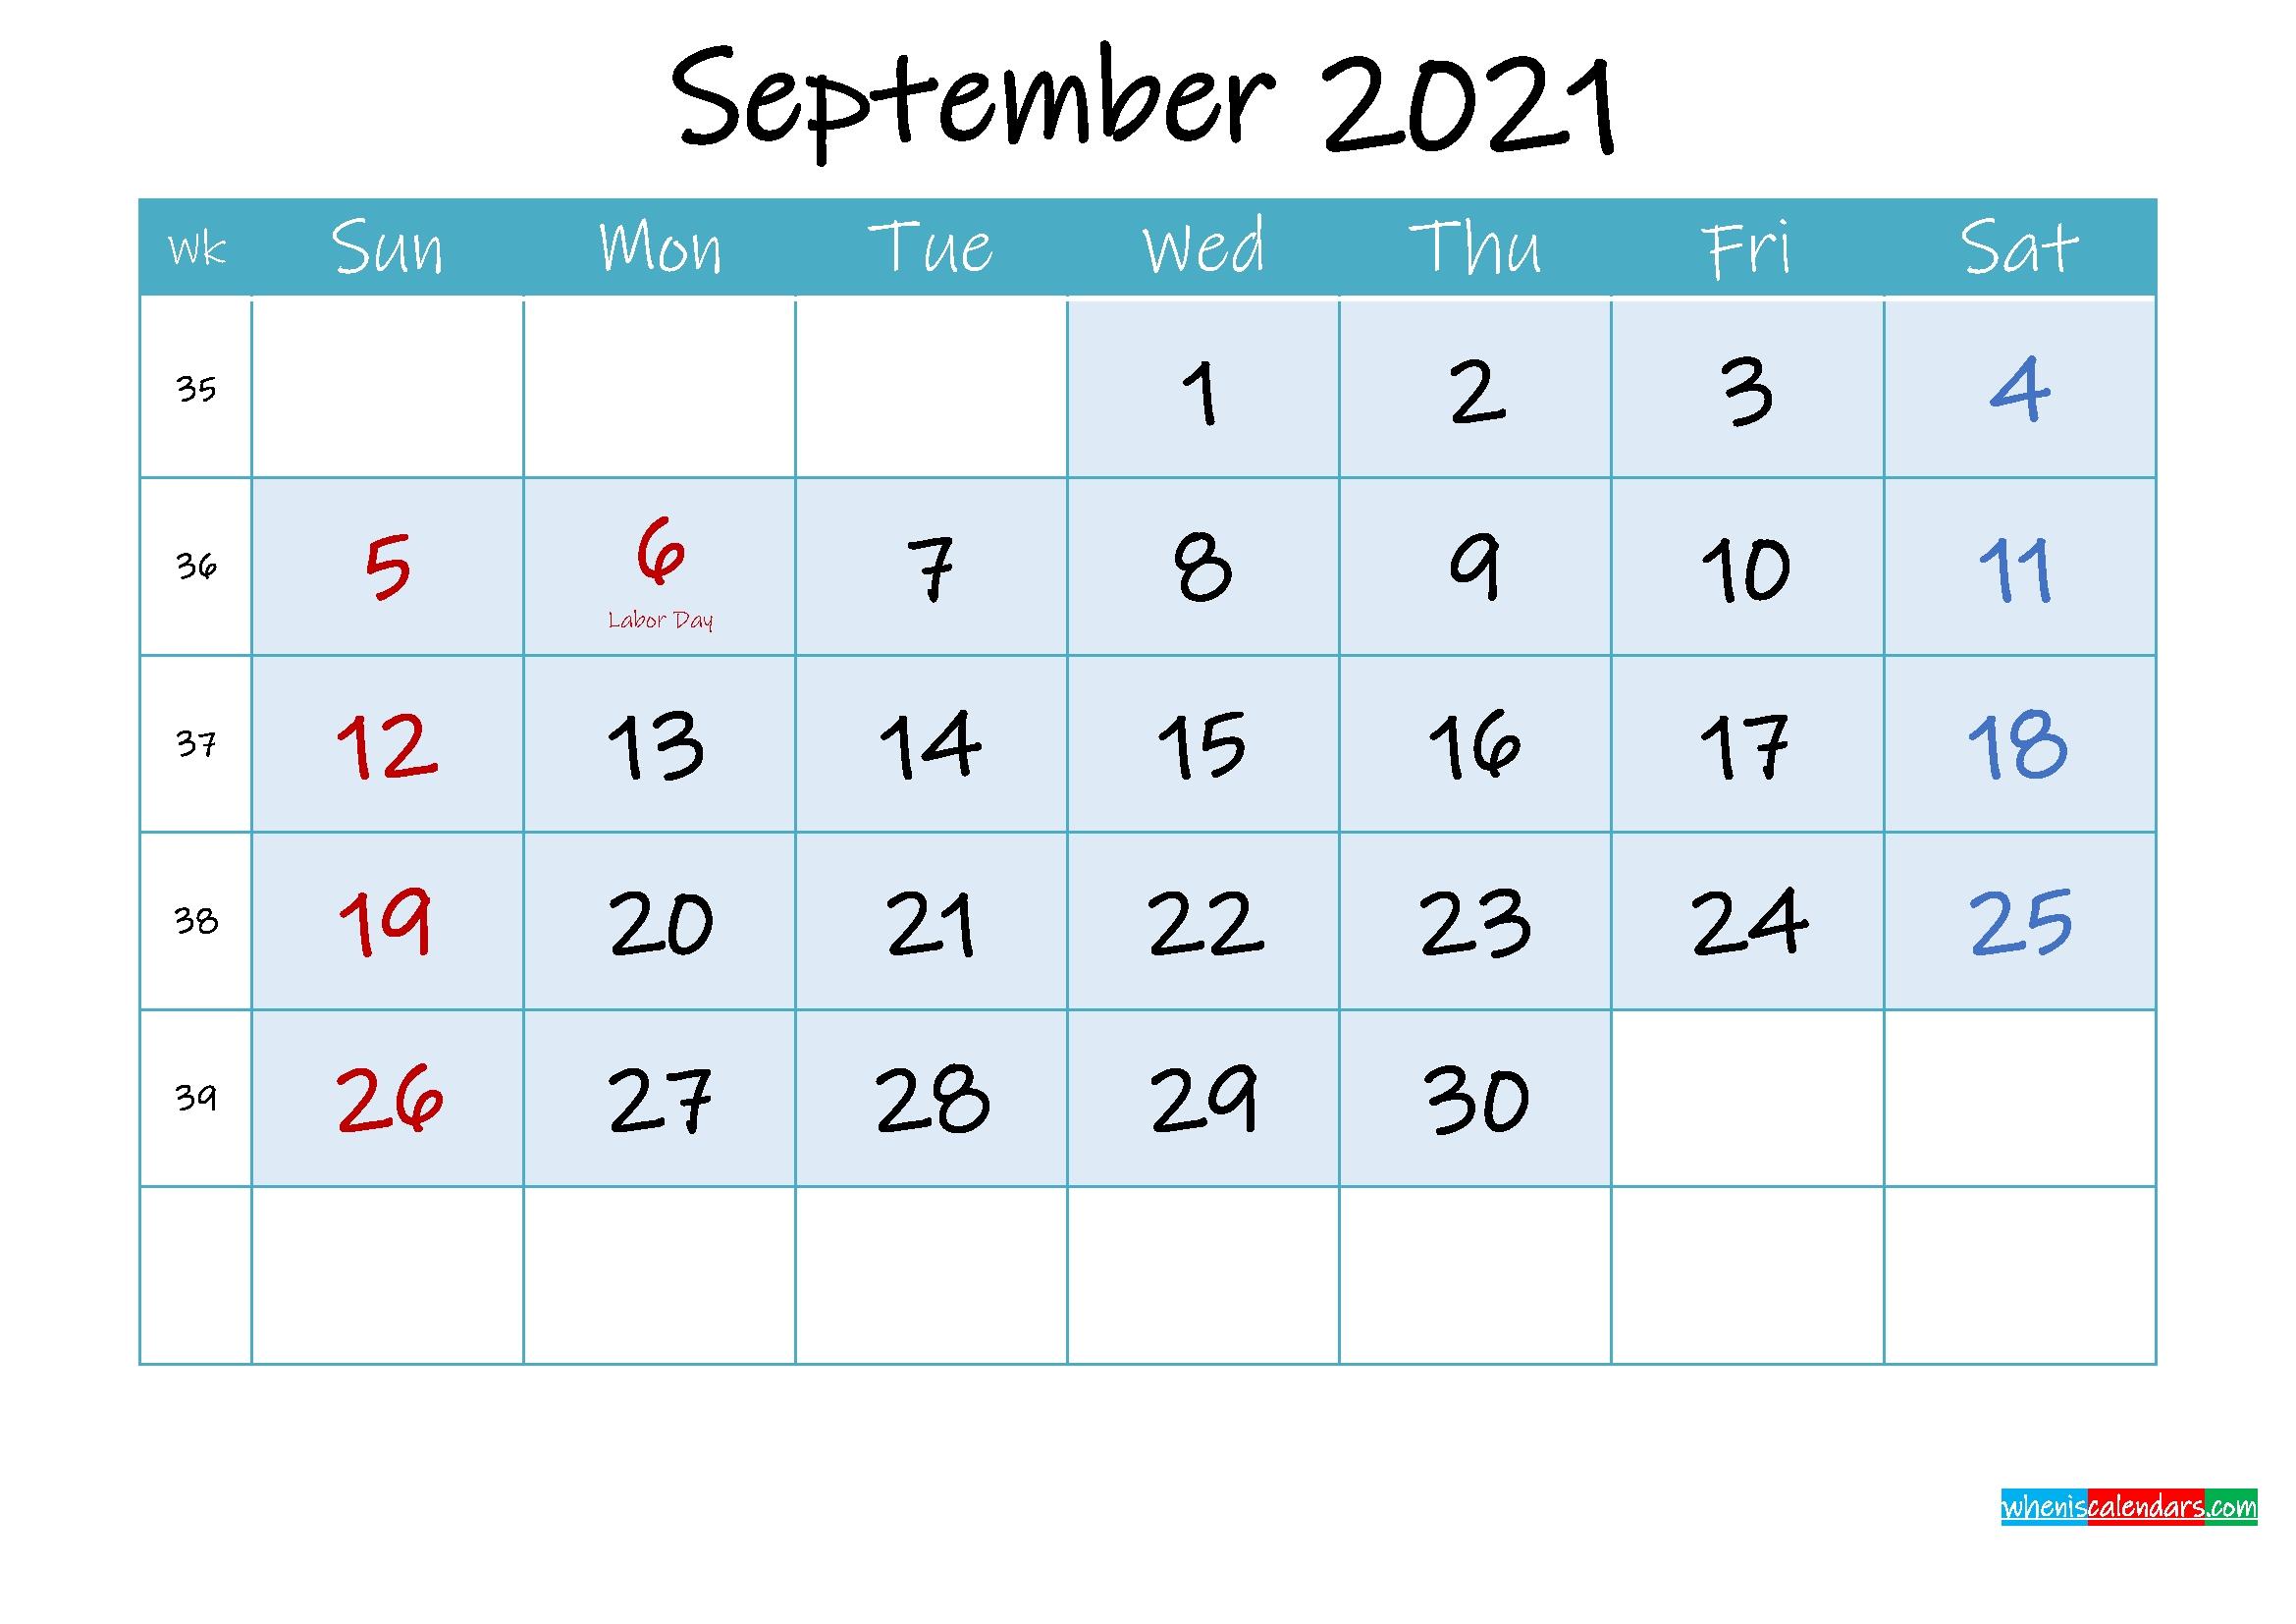 Free Printable September 2021 Calendar With Holidays September 2020 To March 2021 Calendar